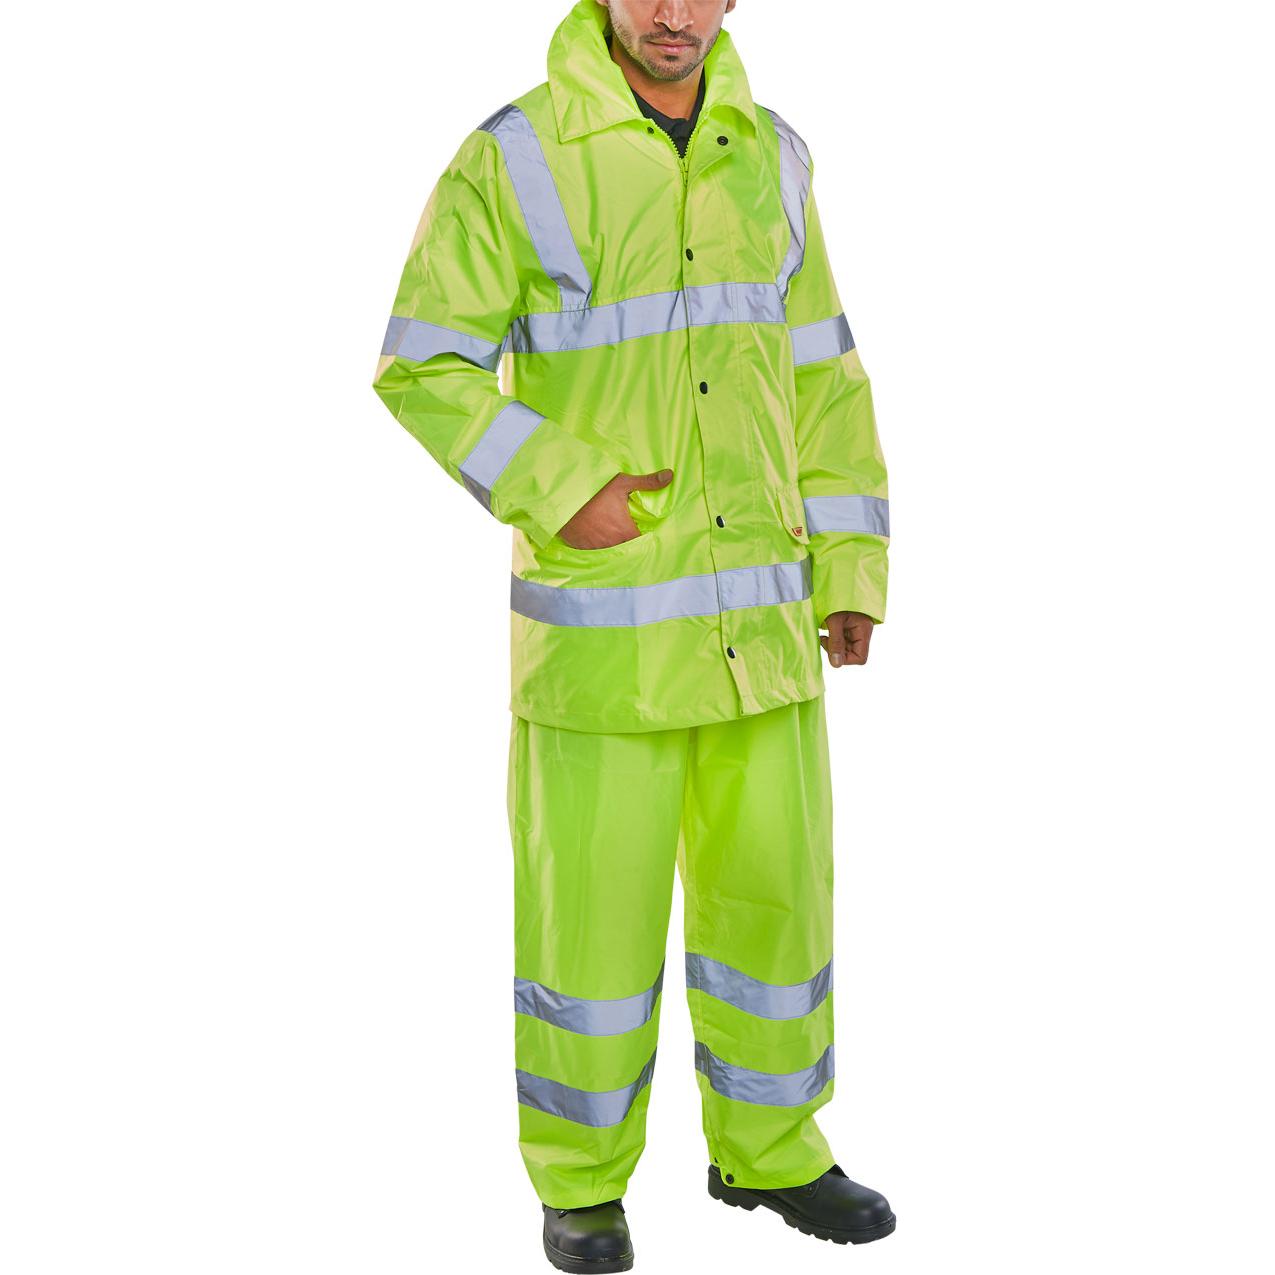 BSeen Hi-Vis L/Wt Suit Jkt/Trs EN ISO 20471 EN 343 Large Saturn Yellow Ref TS8SYL *Up to 3 Day Leadtime*